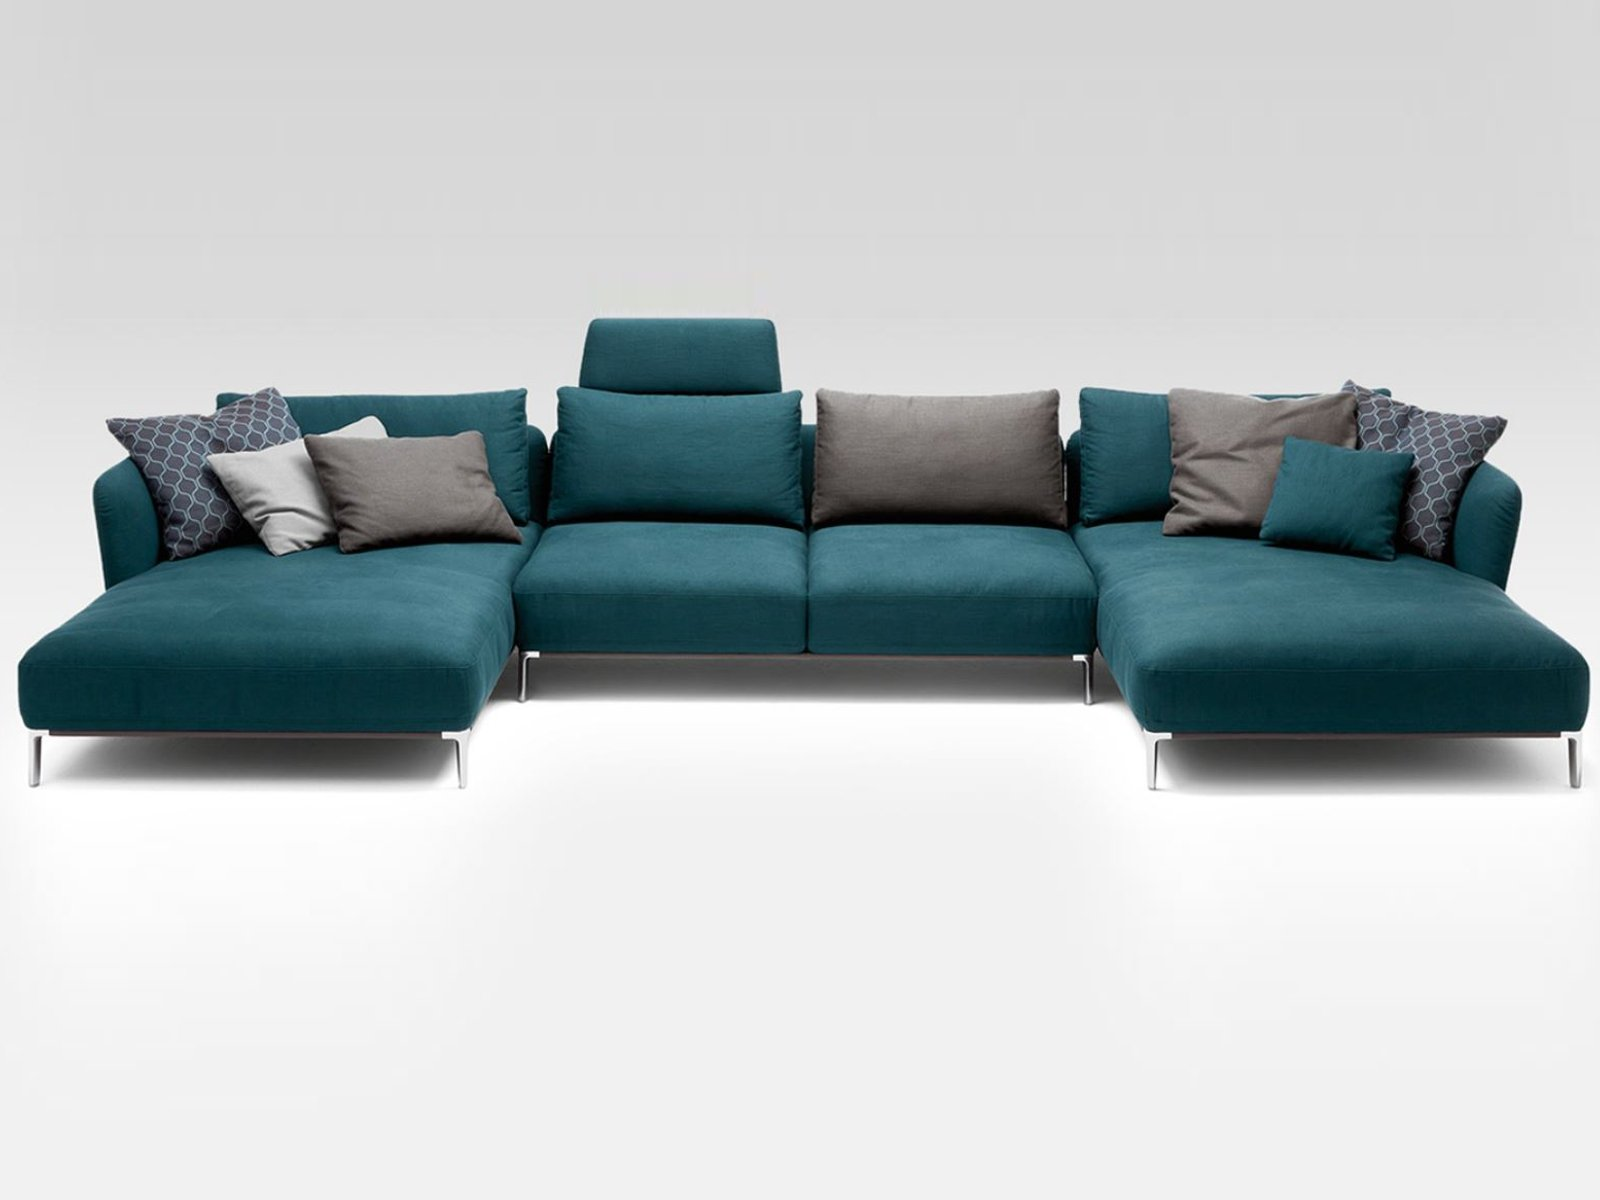 salon cuir conforama images. Black Bedroom Furniture Sets. Home Design Ideas